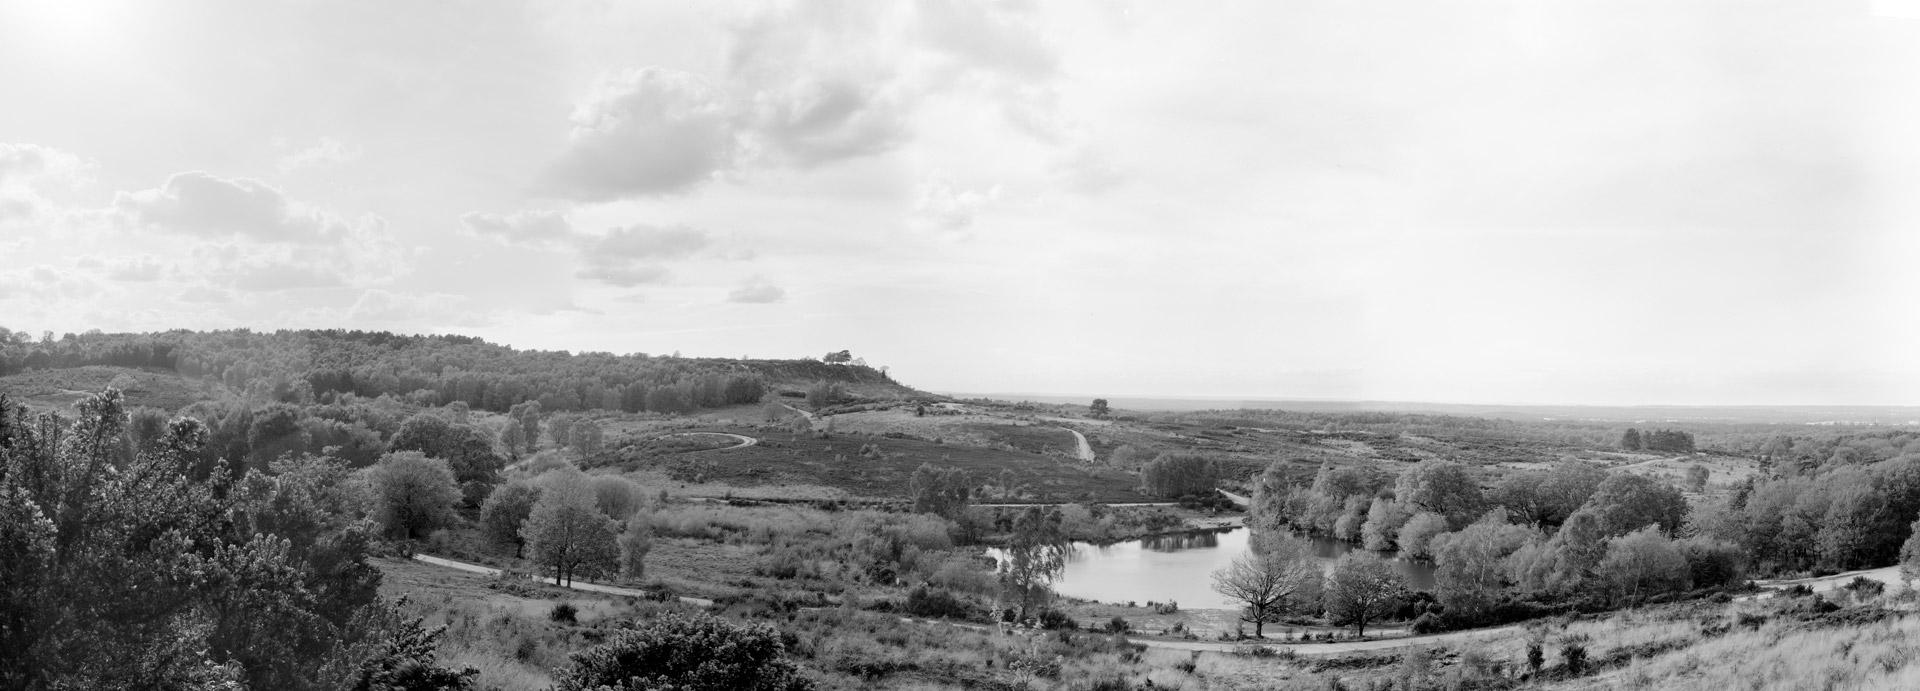 Farnham_Panorama1